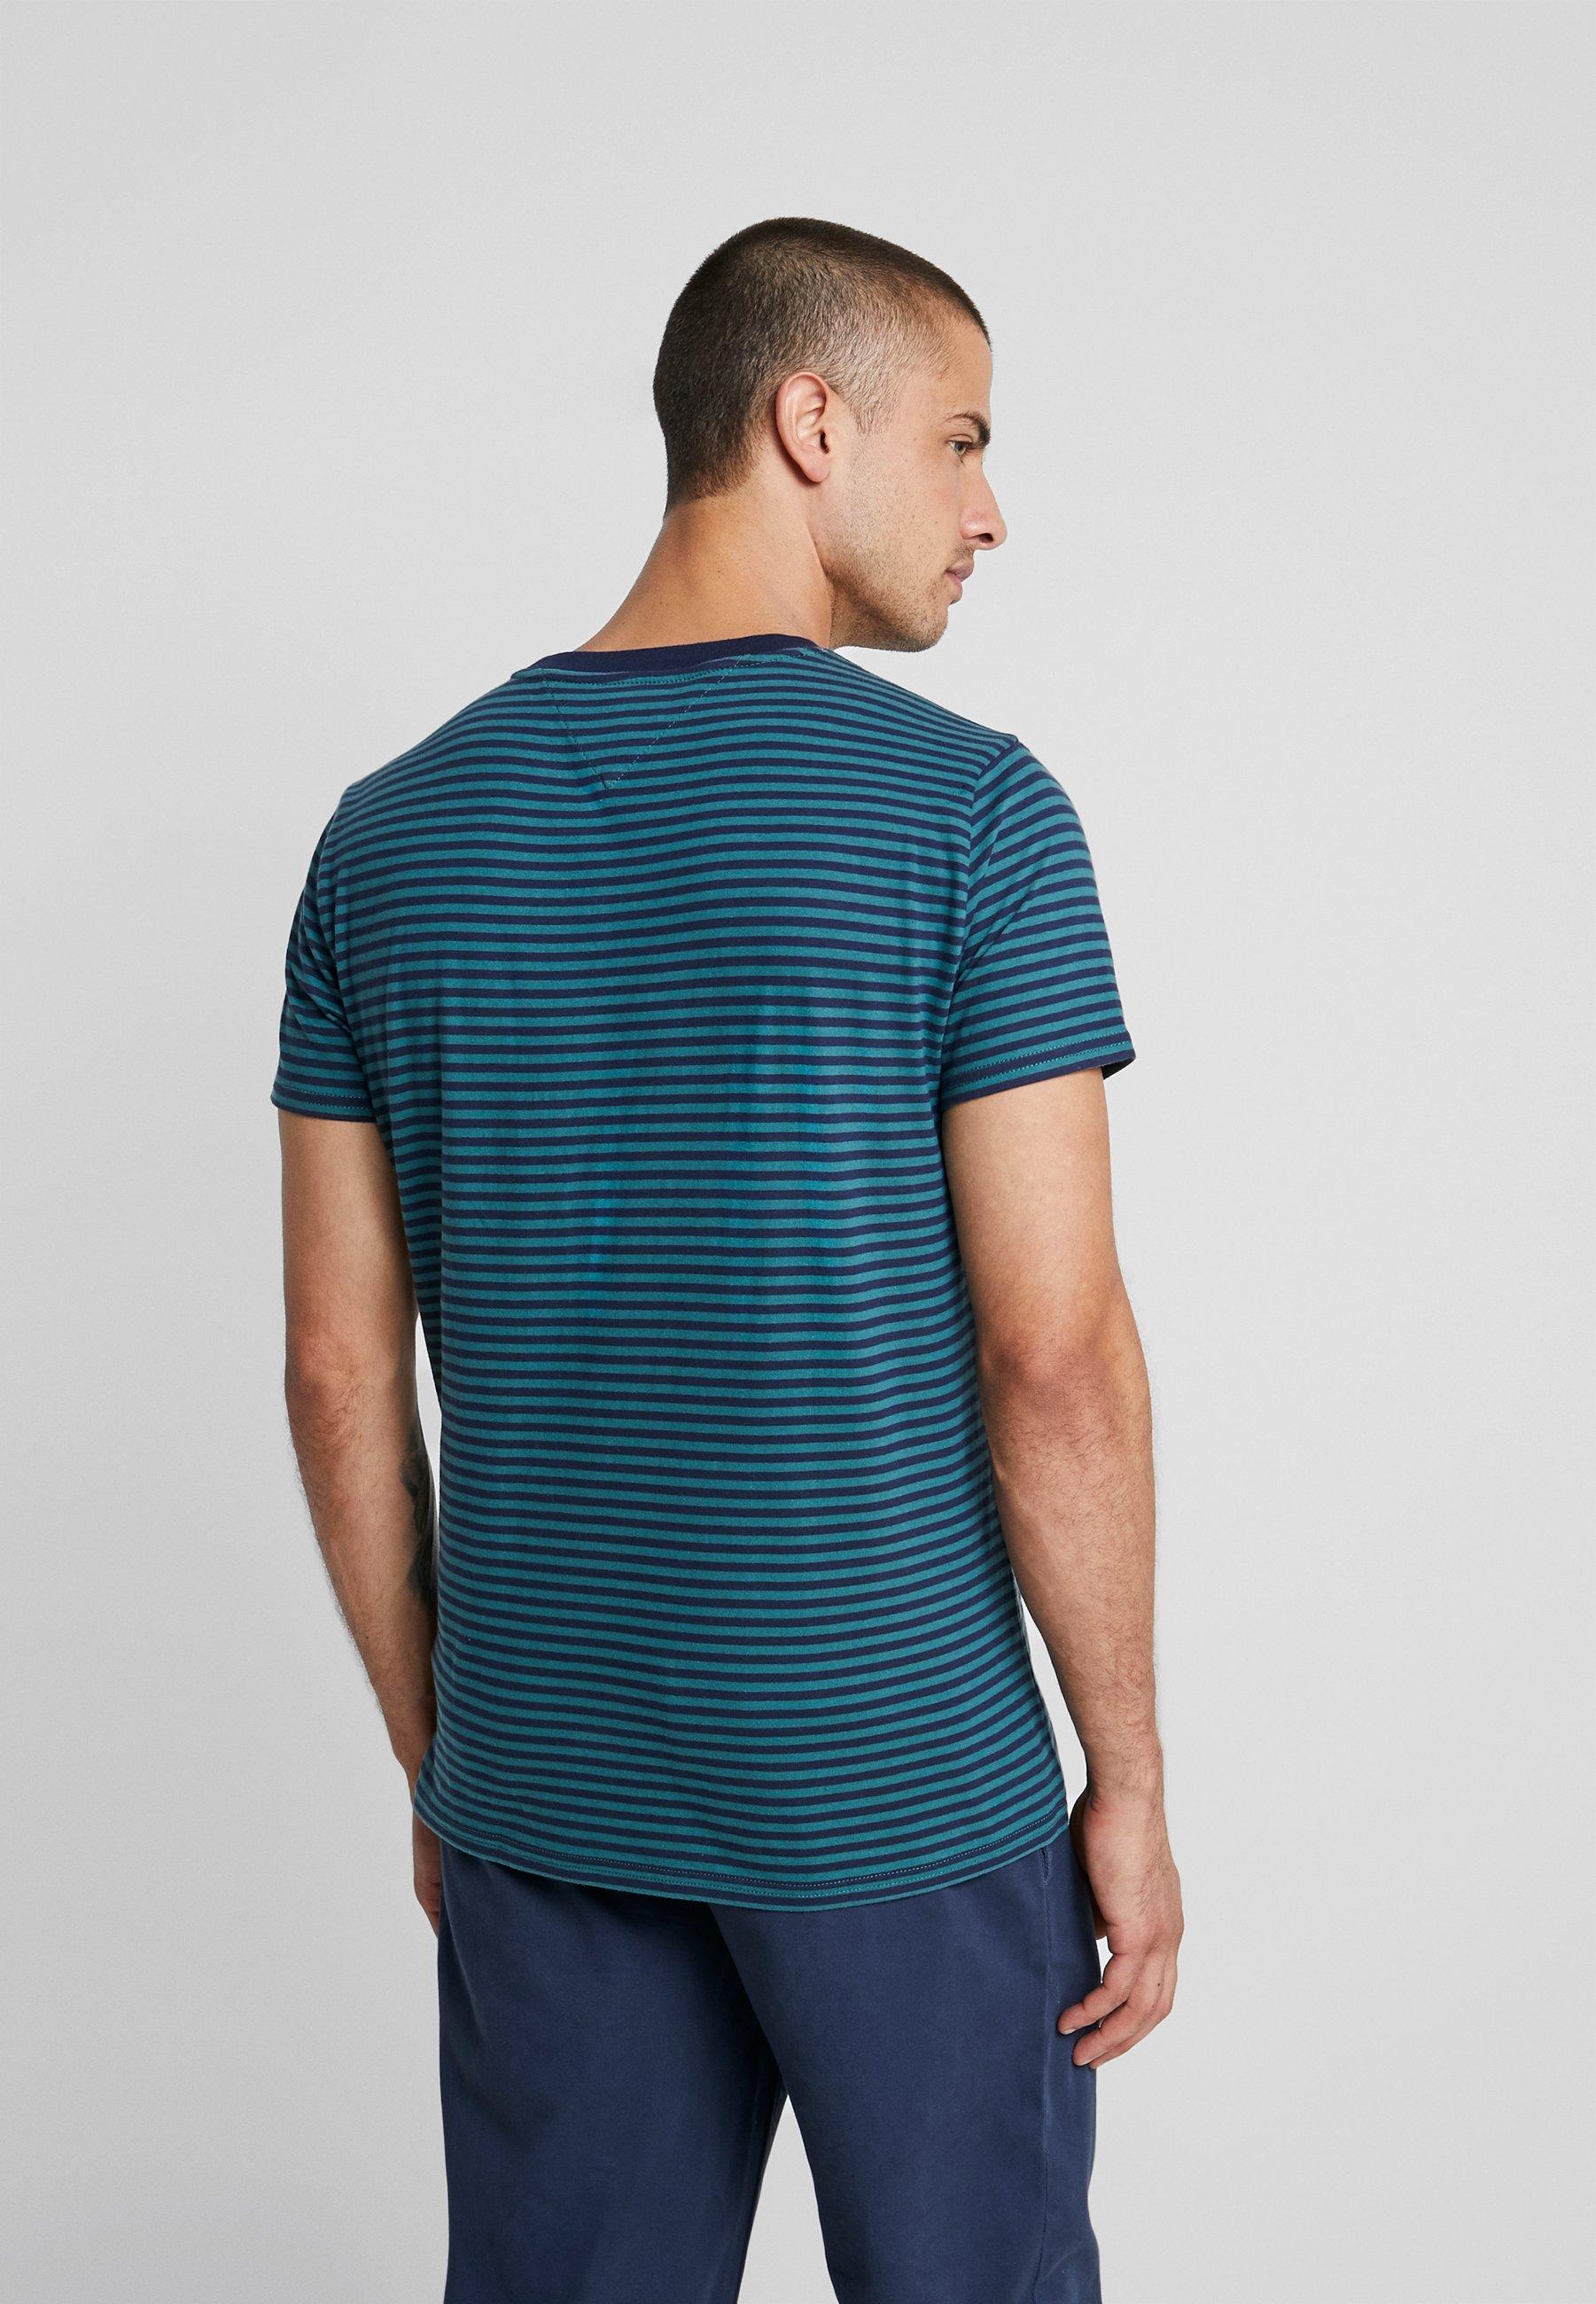 Imprimé Iris shirt Deep Stripe Atlantic black Jeans TeeT Tommy Pocket Y6g7ybf